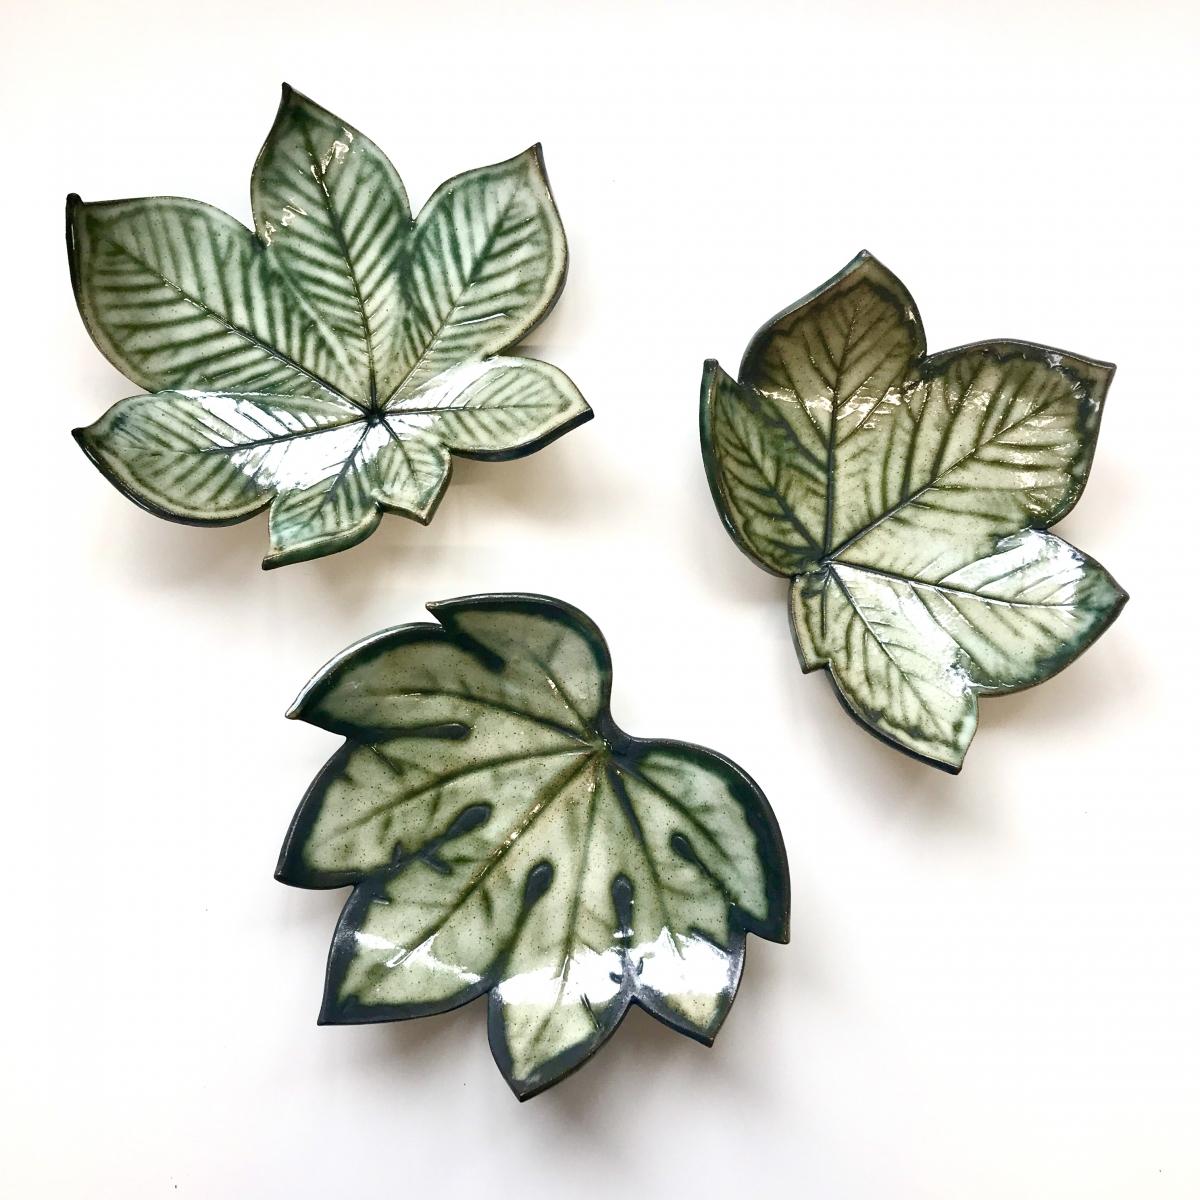 Leaf Trinket Dishes by Sonya Ceramic Art in Rustic Green